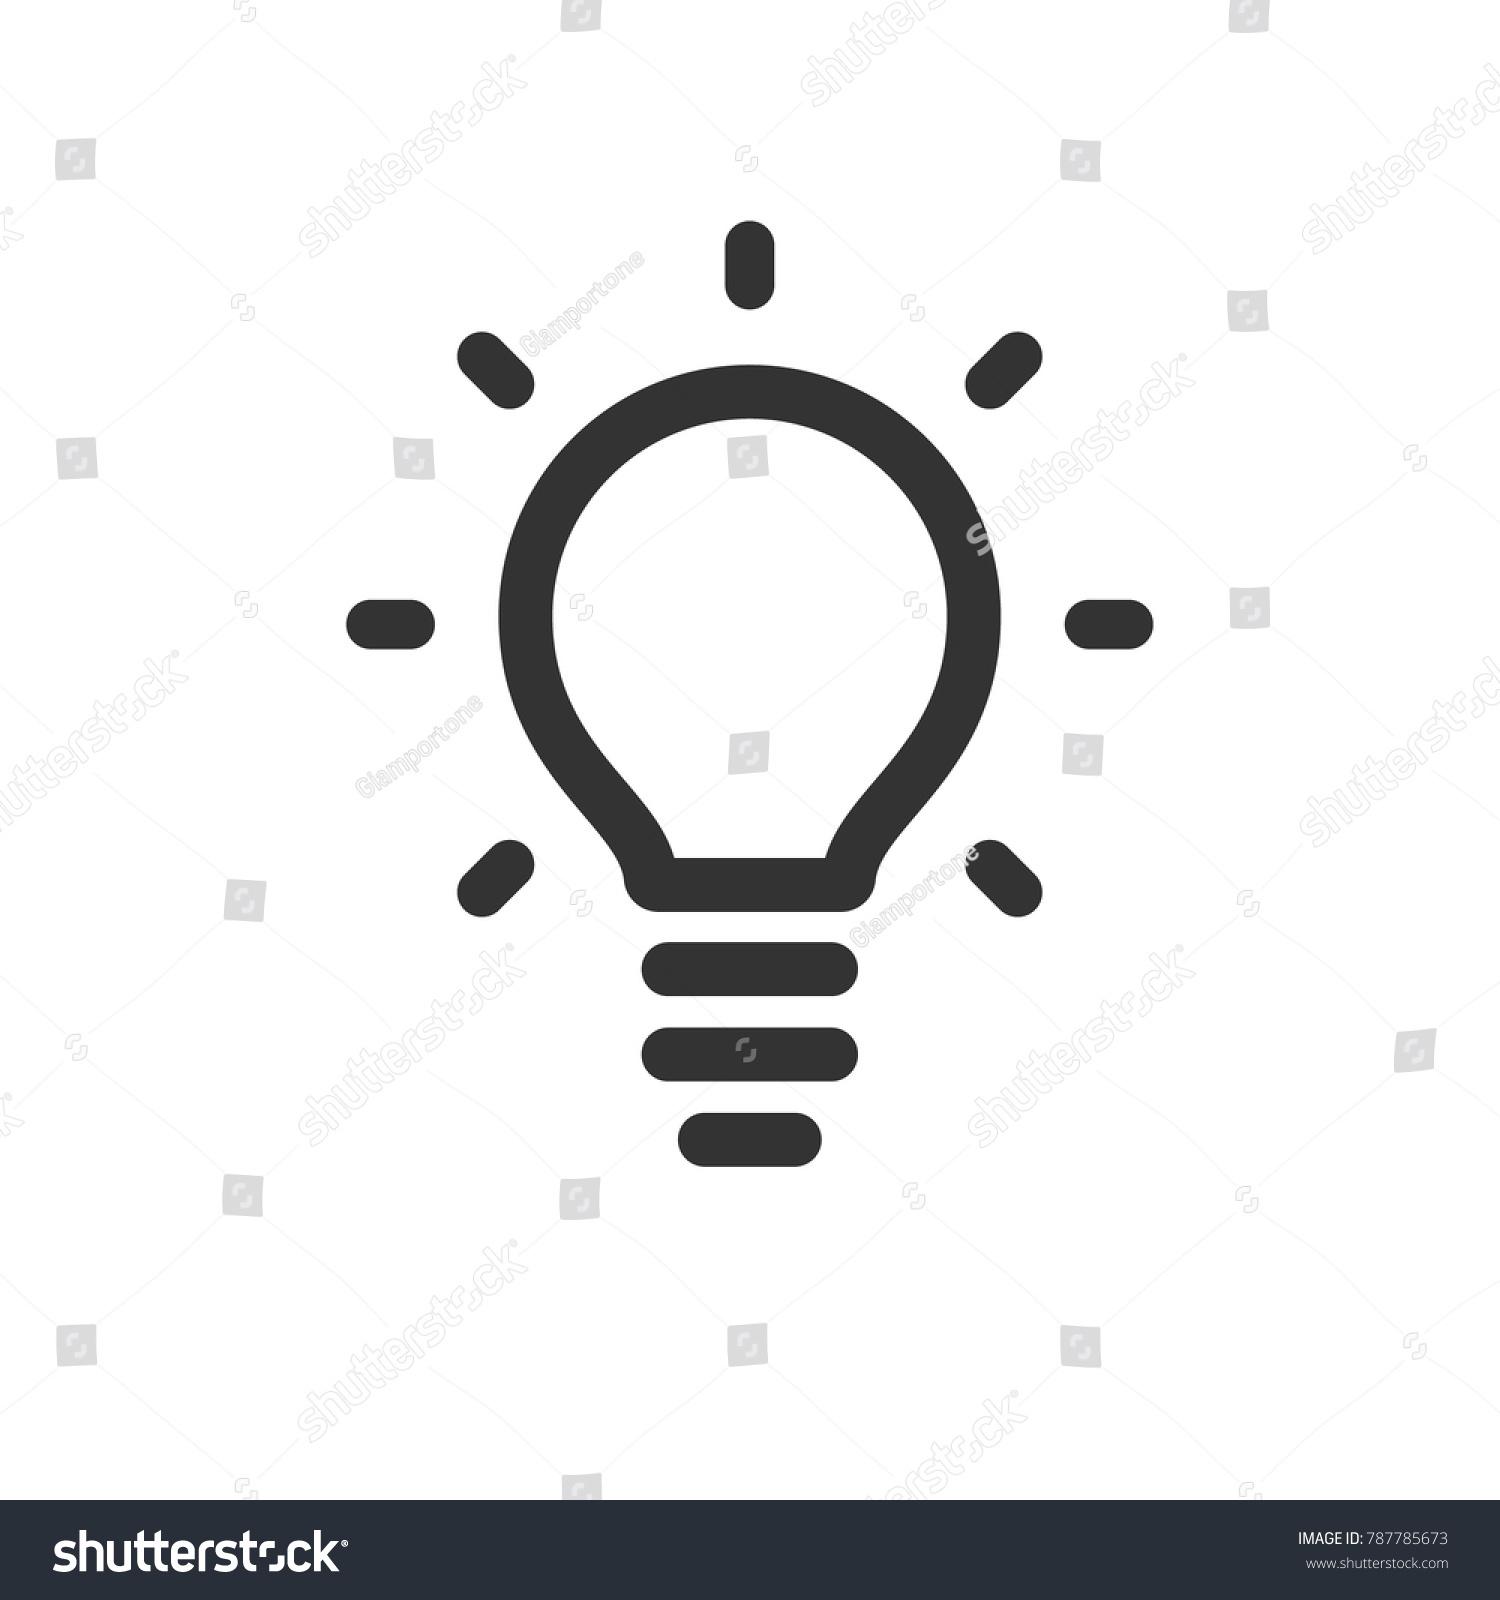 Electrical symbol for light bulb dolgular symbol for light bulb image collections symbol and sign ideas biocorpaavc